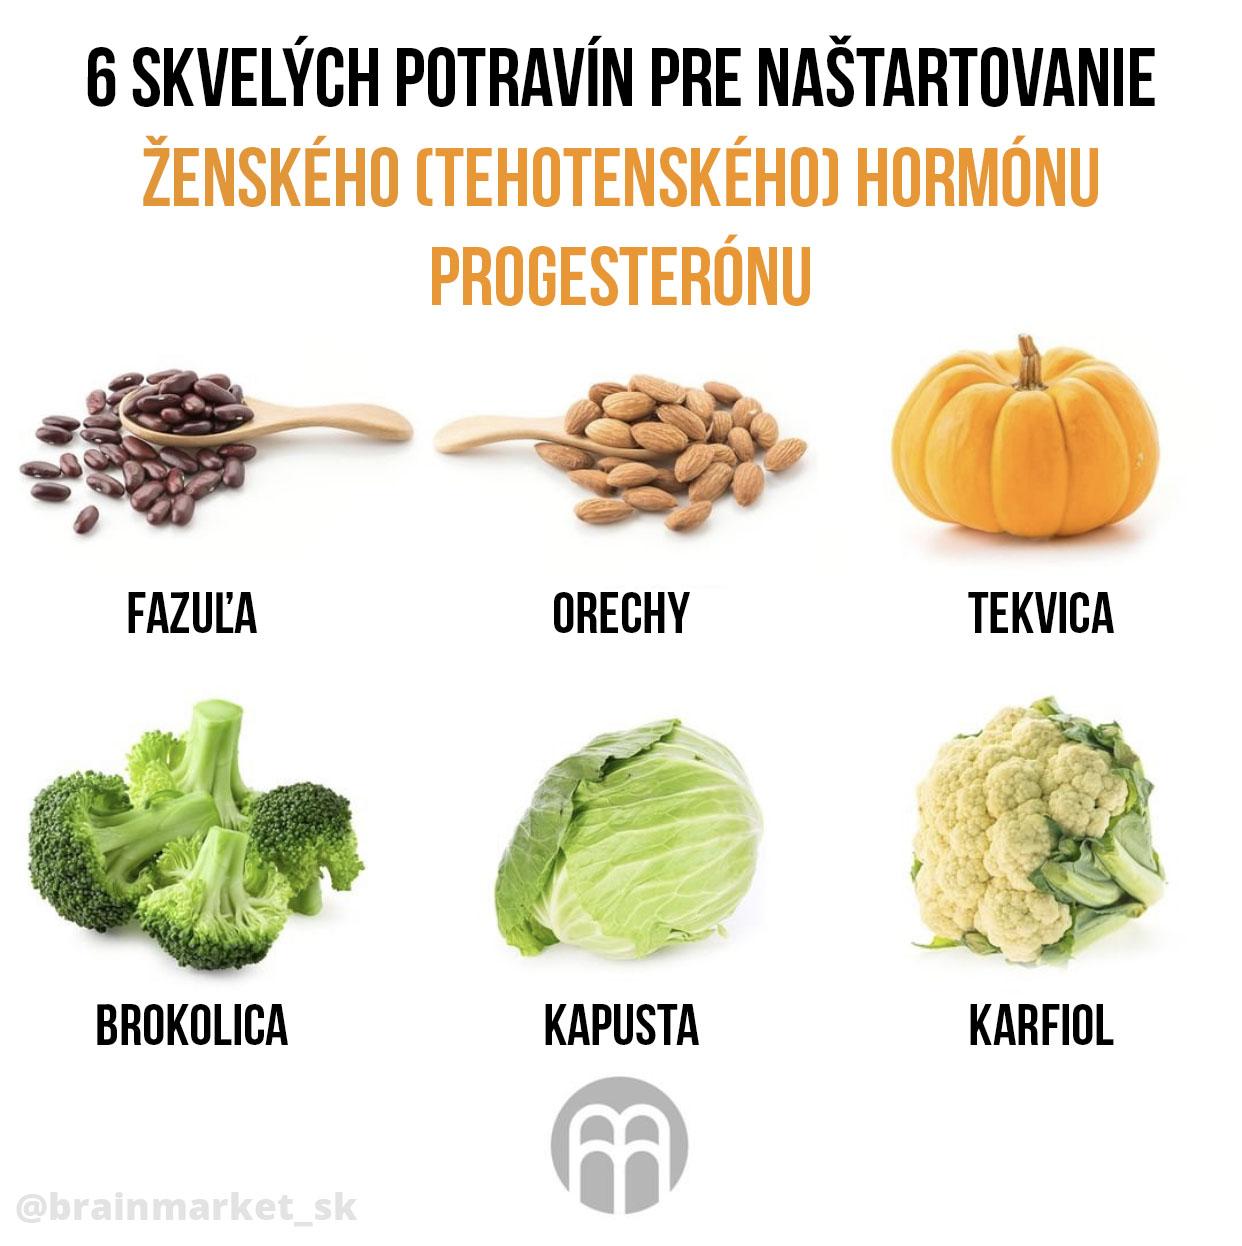 progesteron-potraviny-infografika-brainmarket-sk